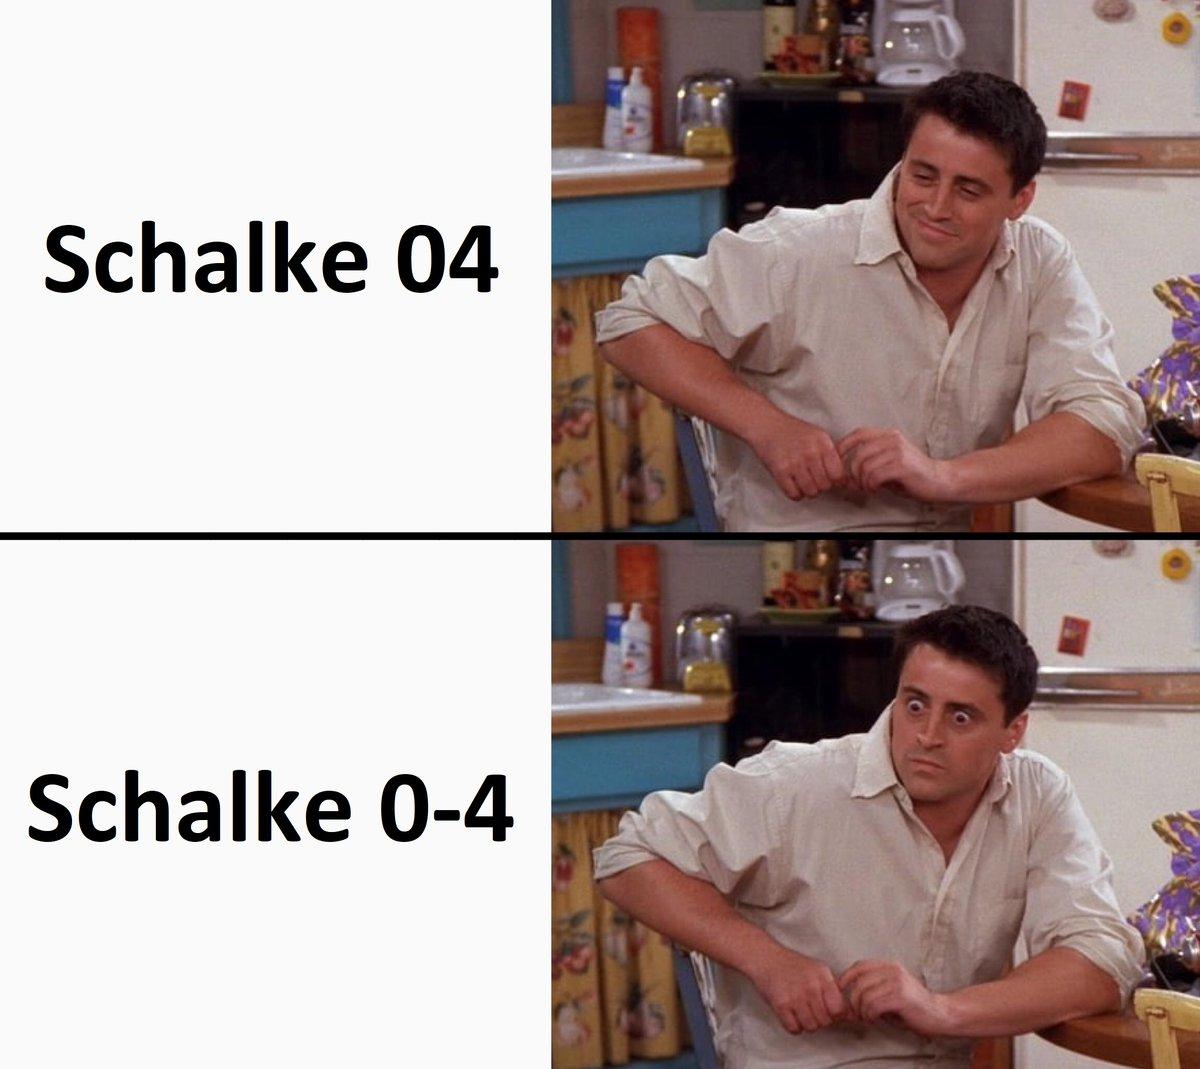 Schalke fans right now #LEC